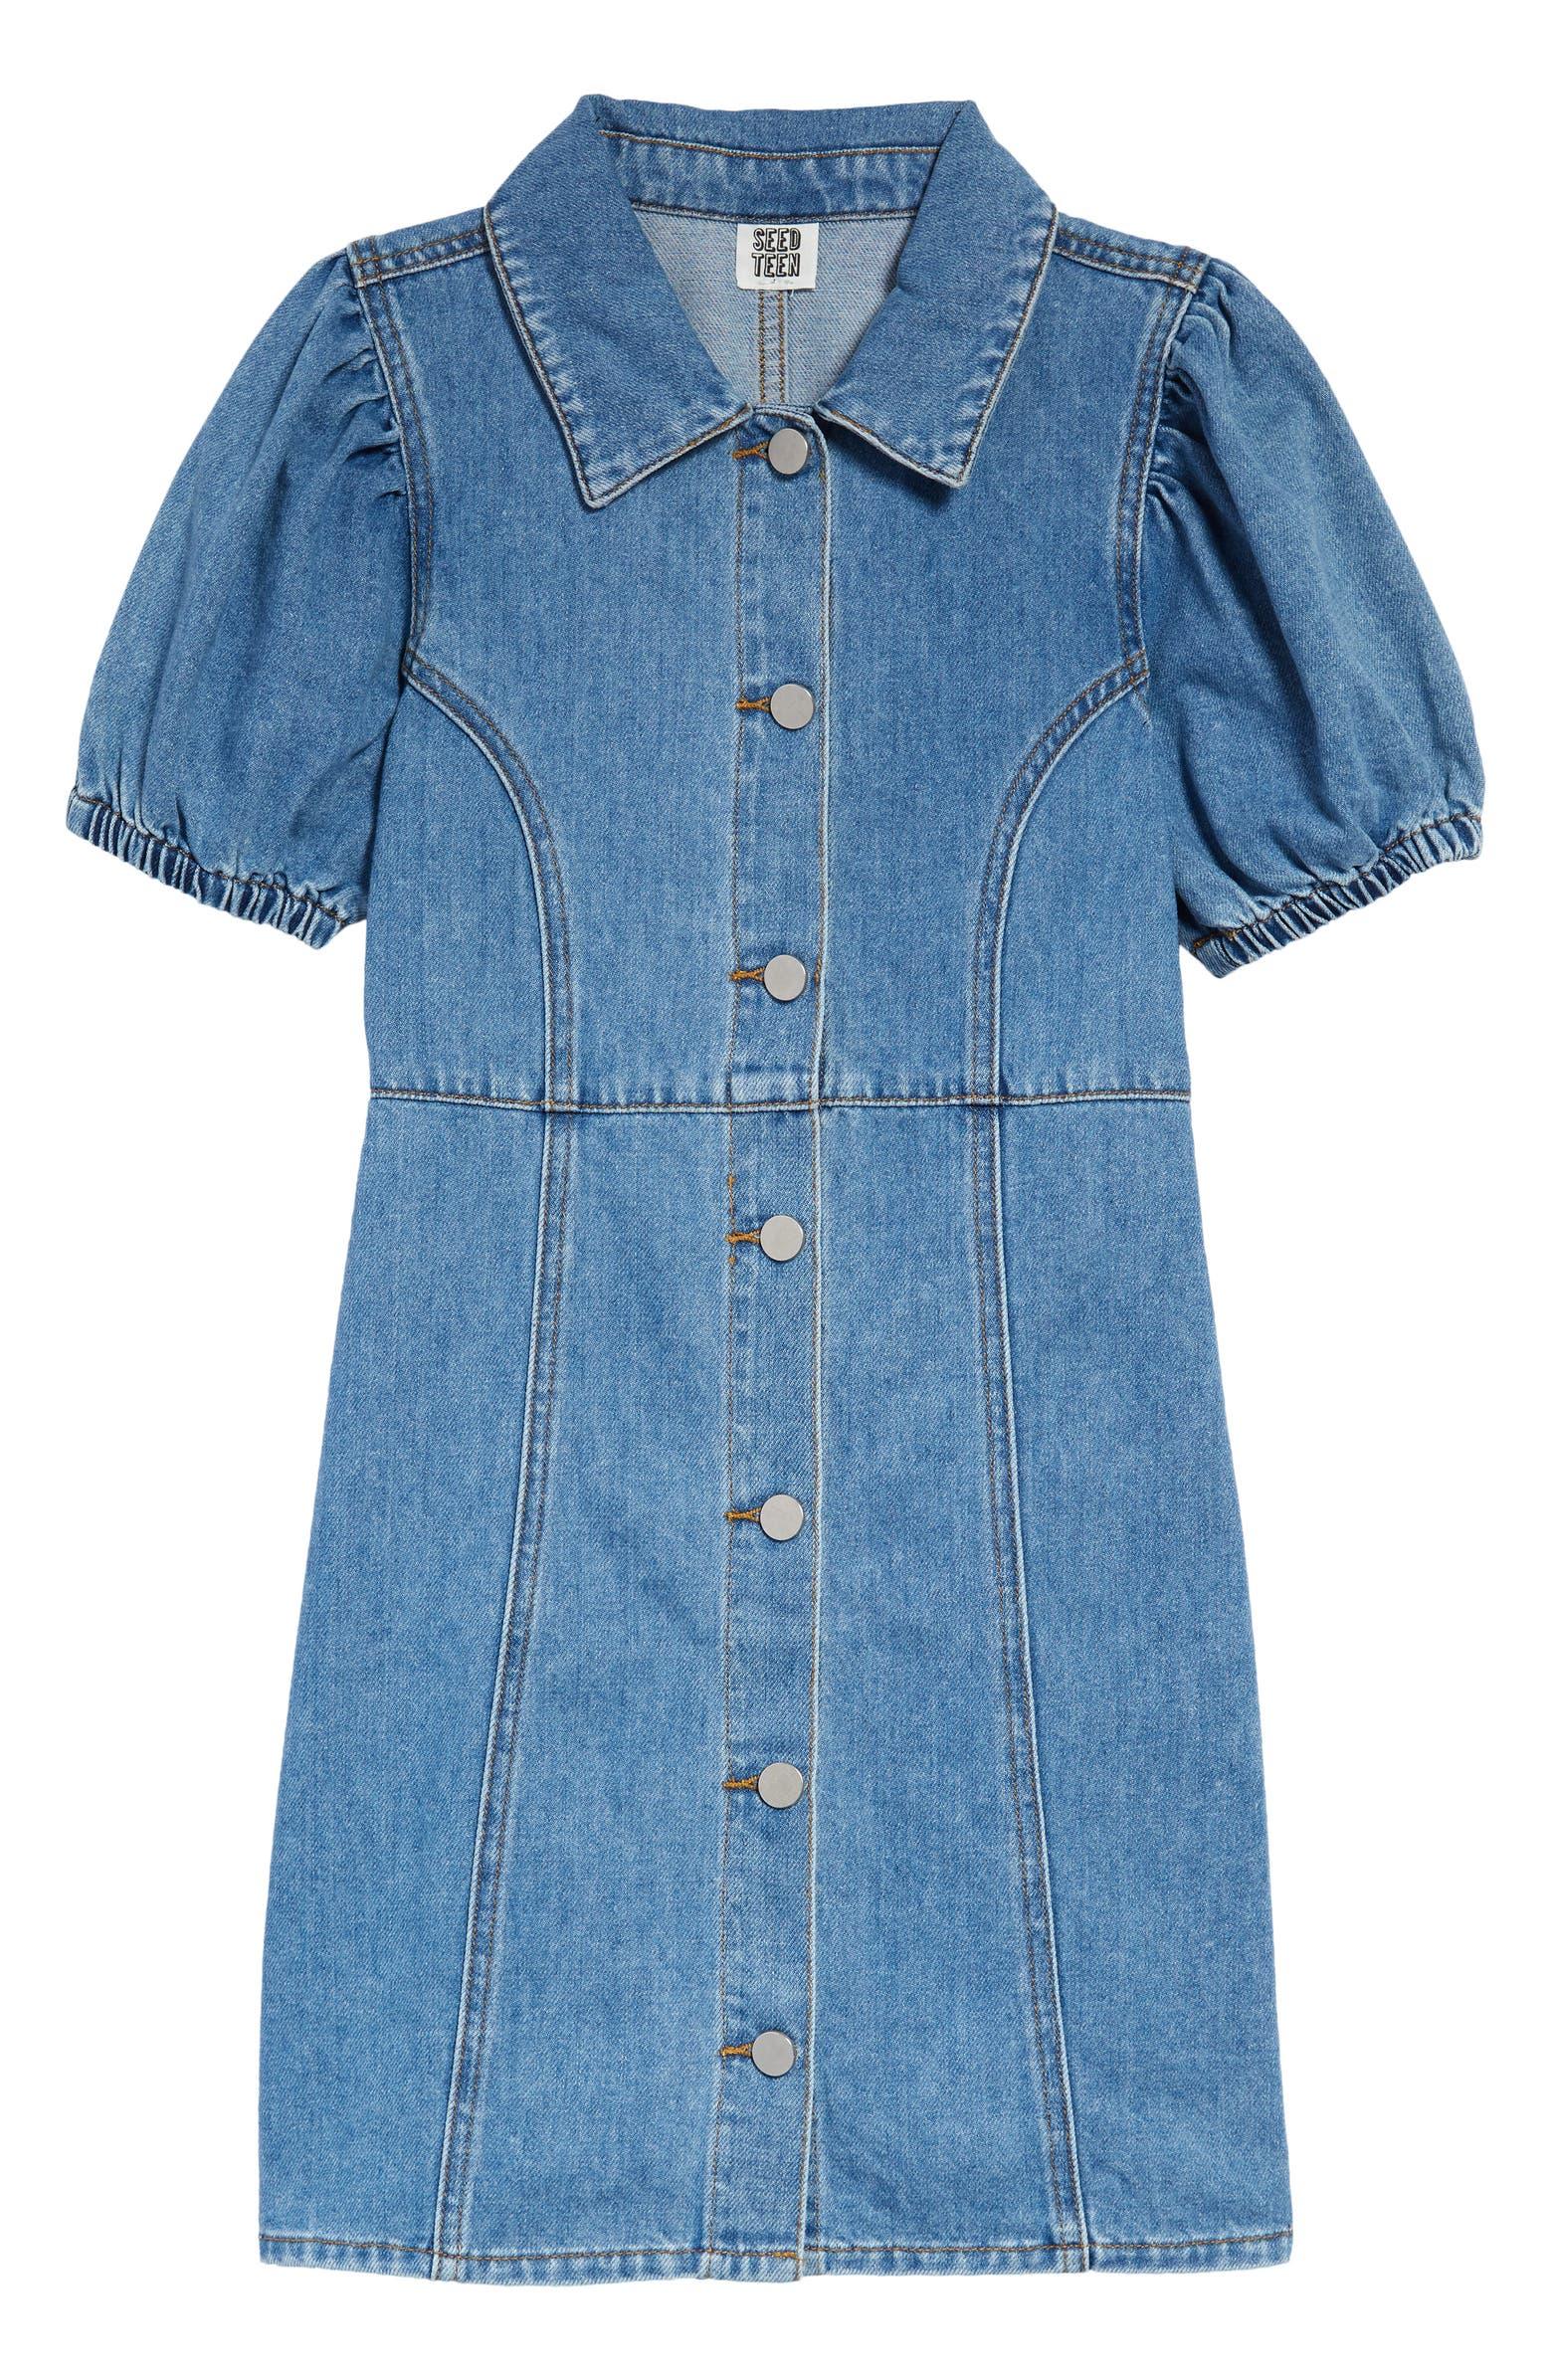 Kids' denim dress